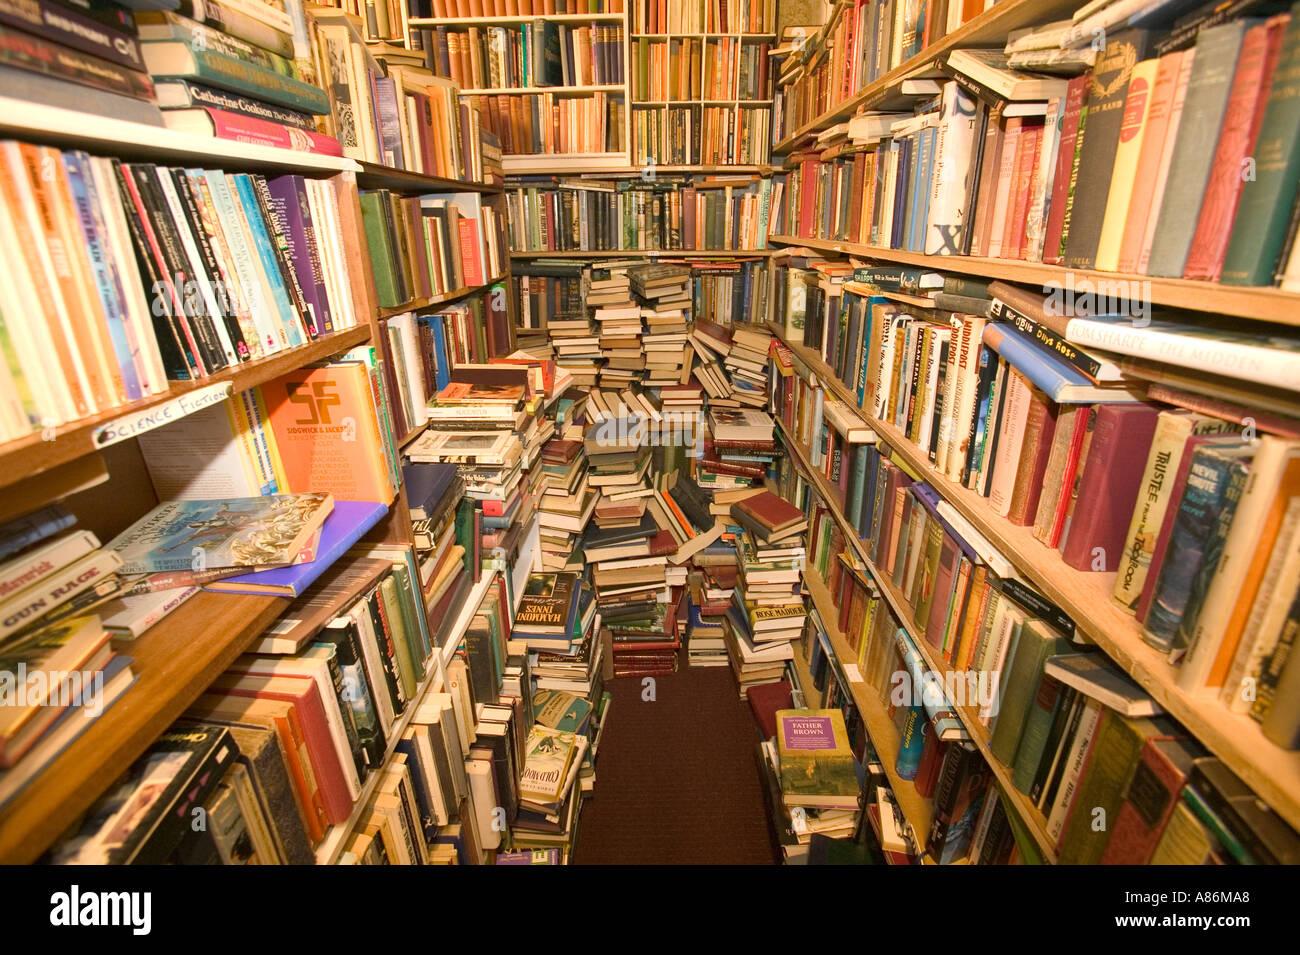 secondhand bookshop in Kirkudbright - Stock Image